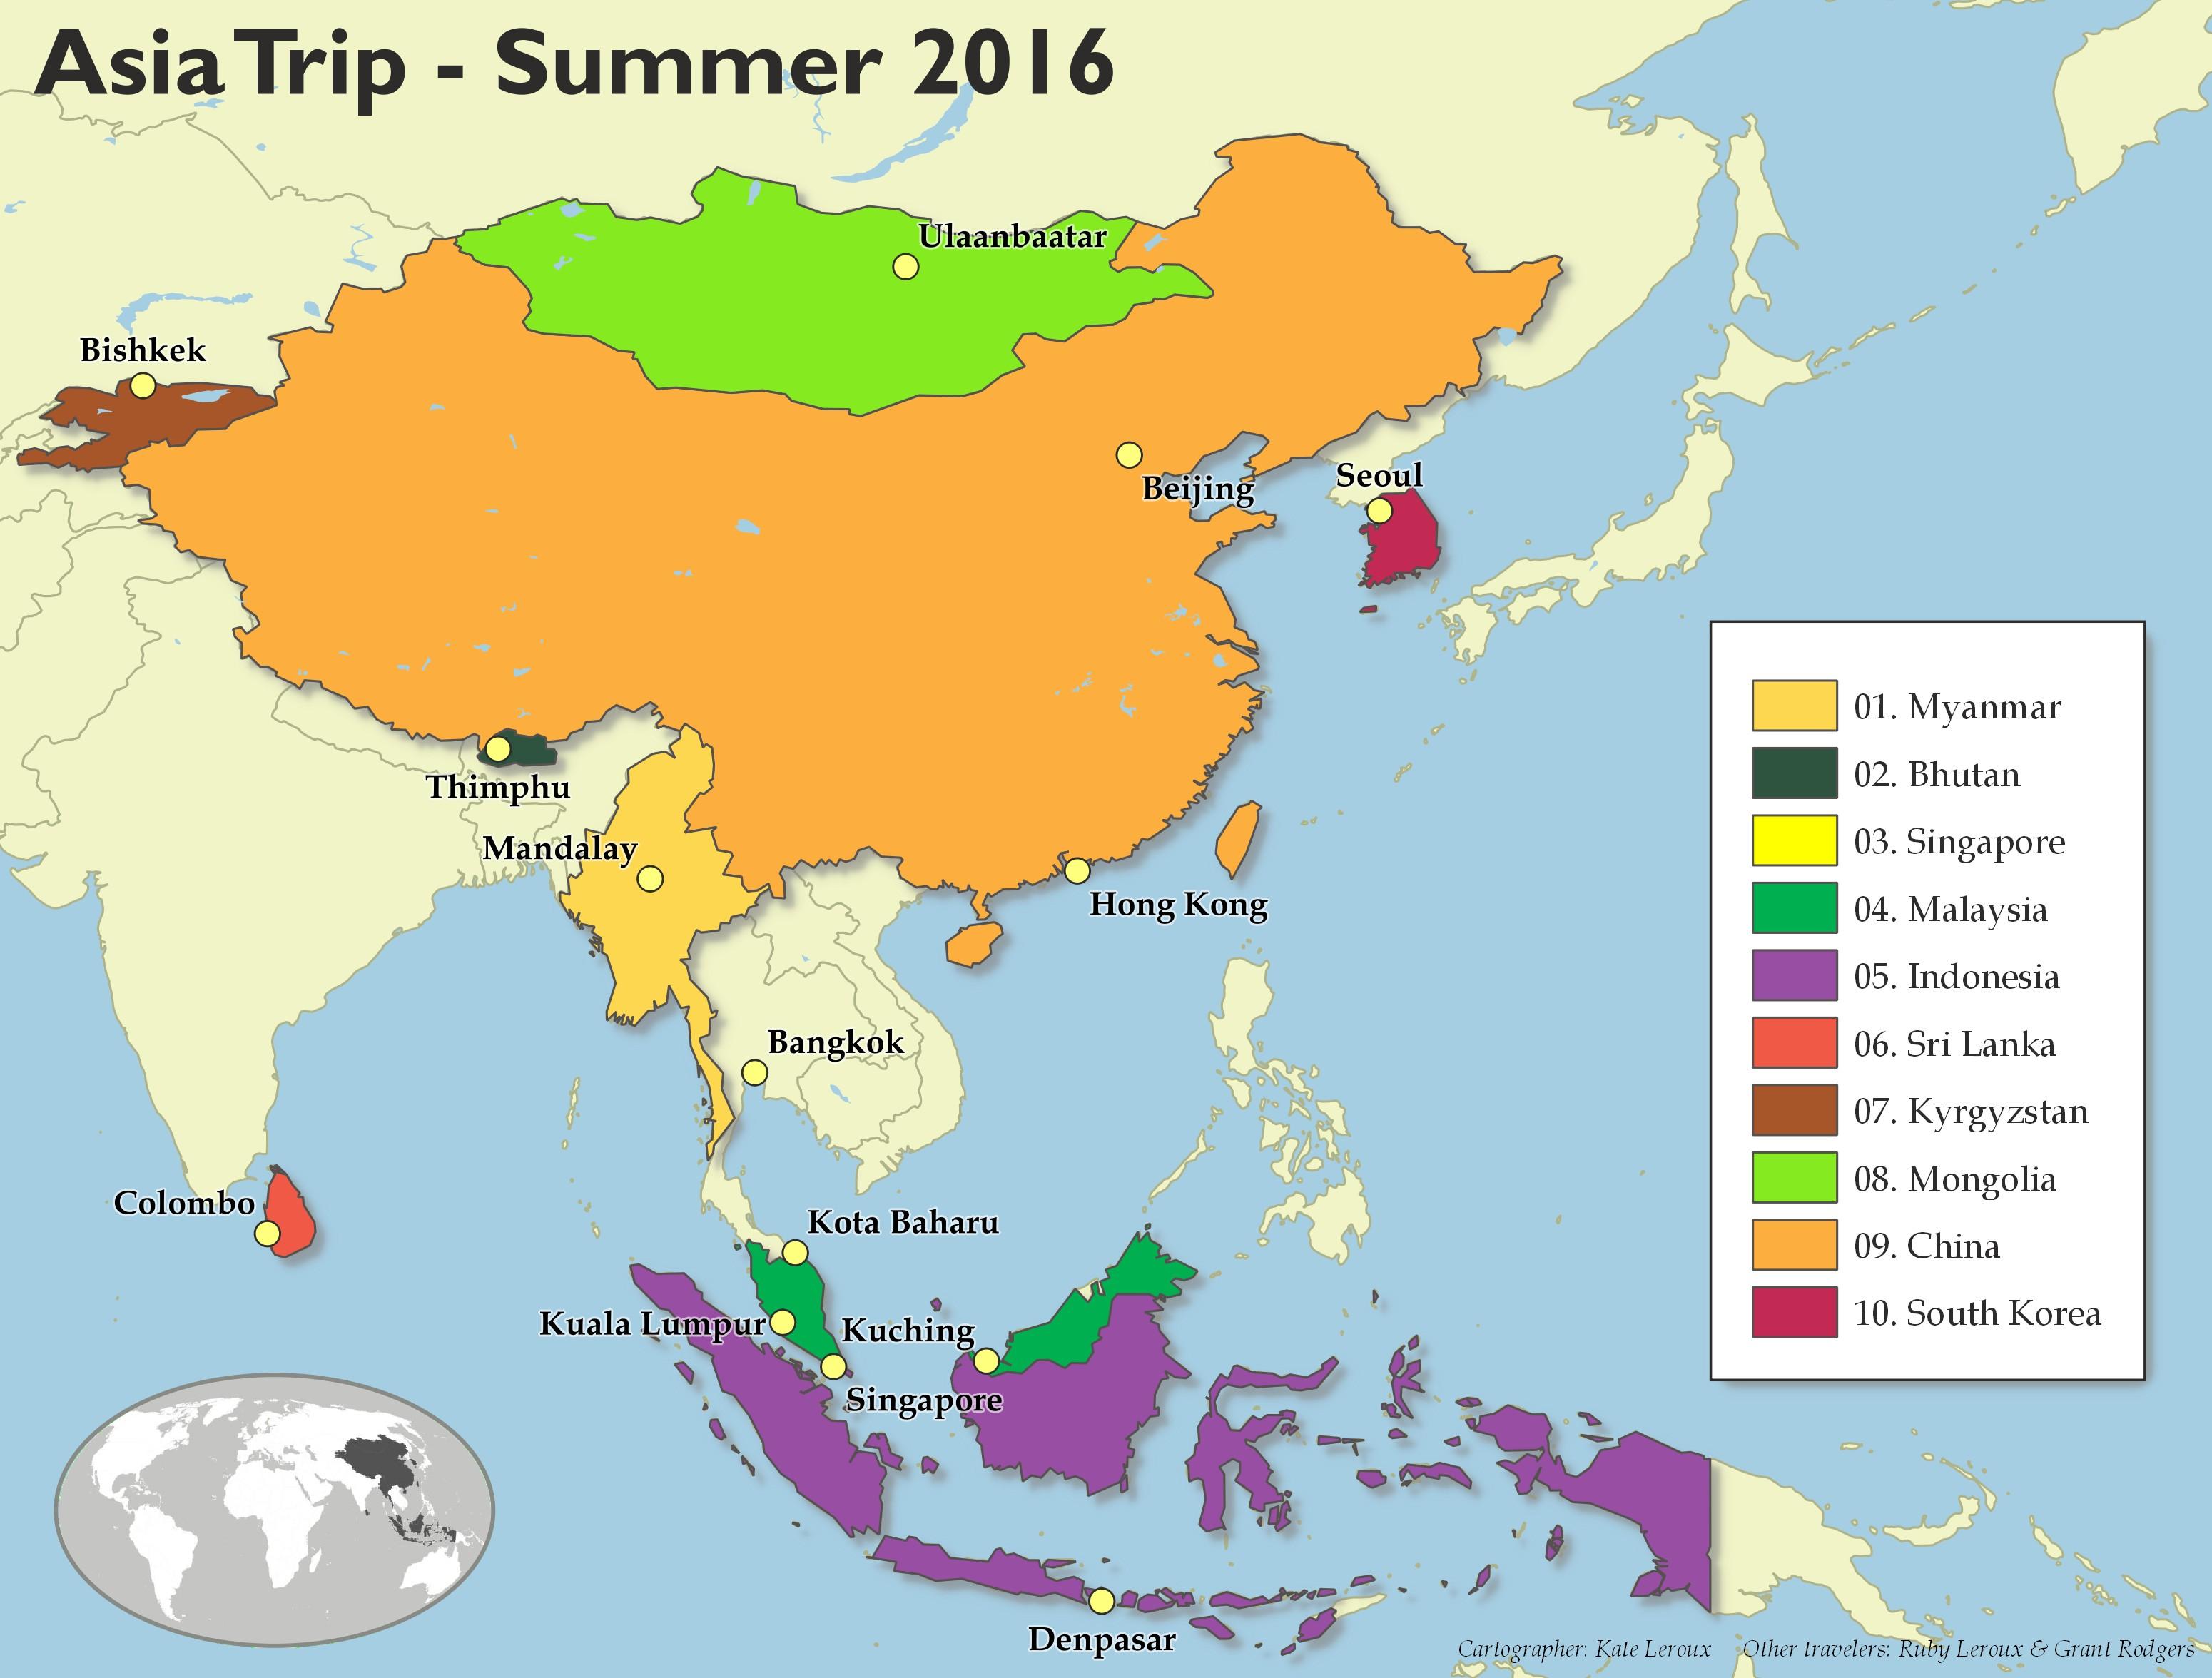 Asia-trip-map